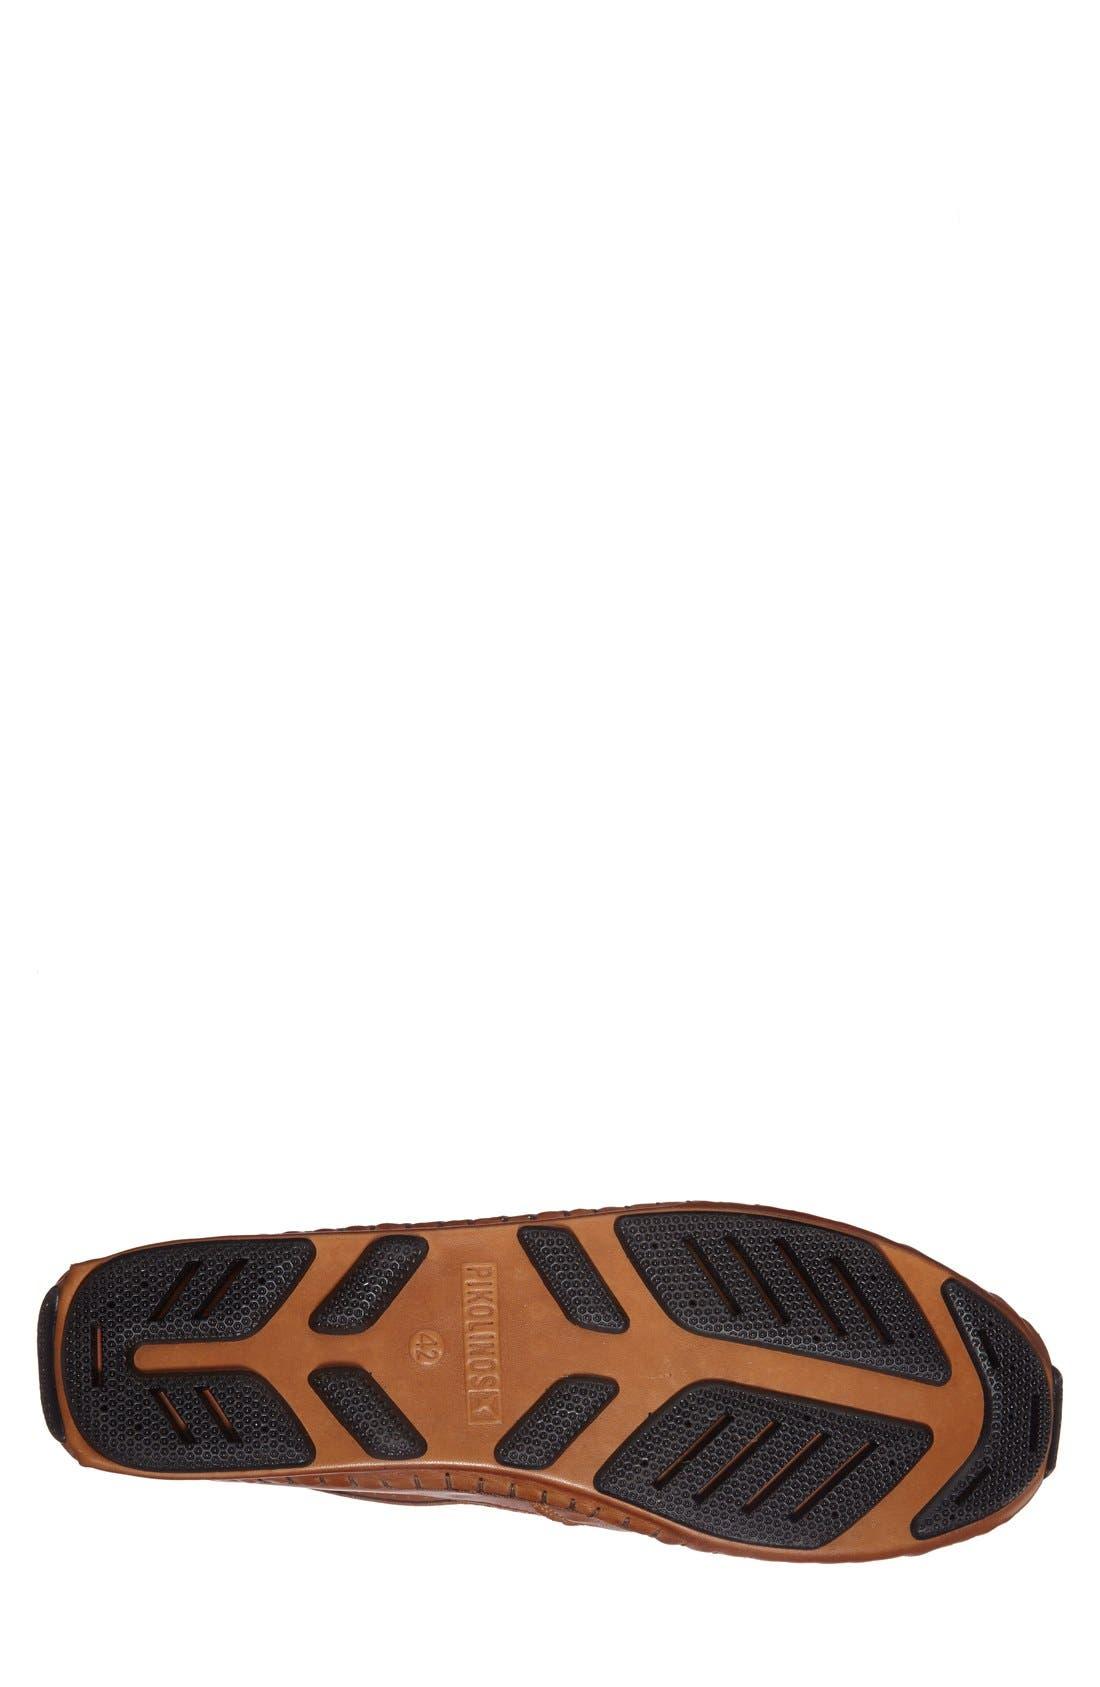 'Jerez' Driving Shoe,                             Alternate thumbnail 4, color,                             Brandy